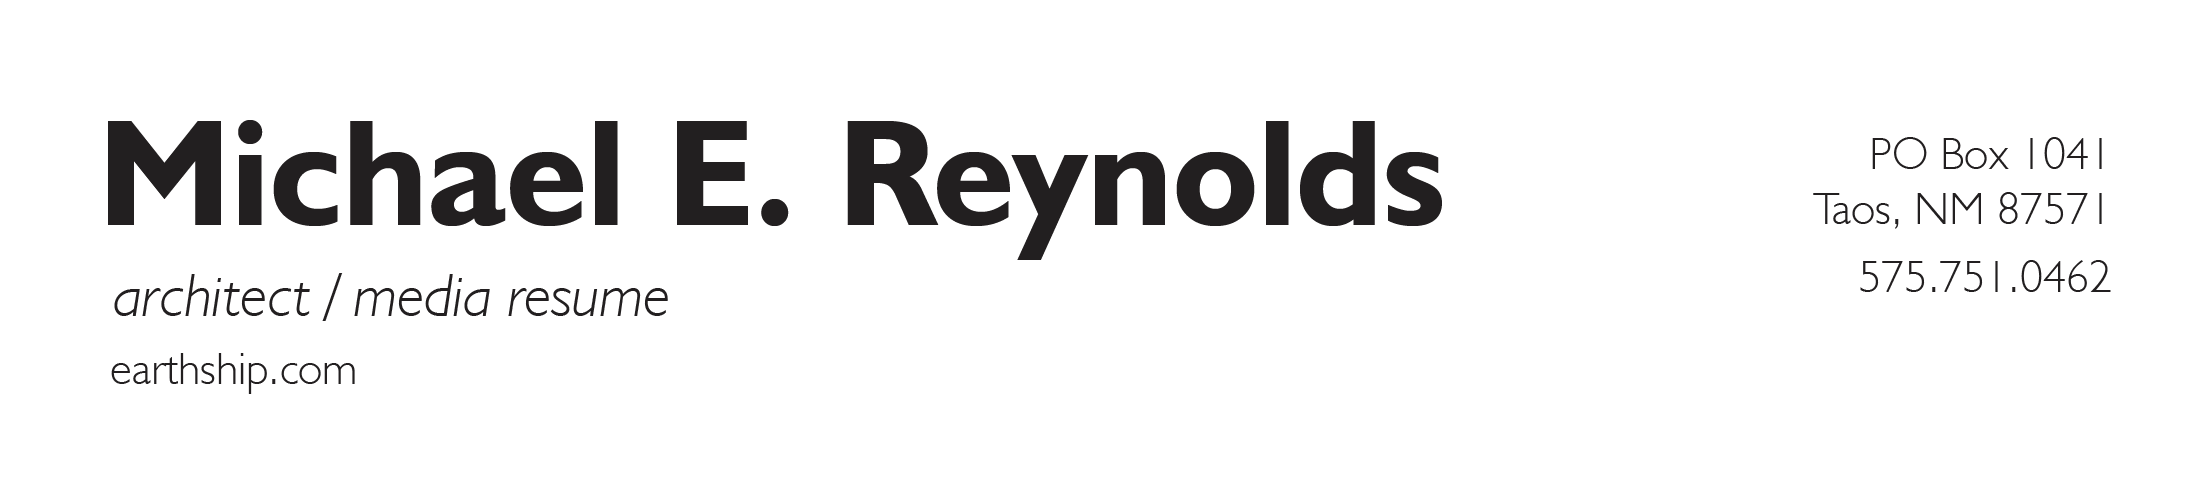 Michael_Reynolds.png